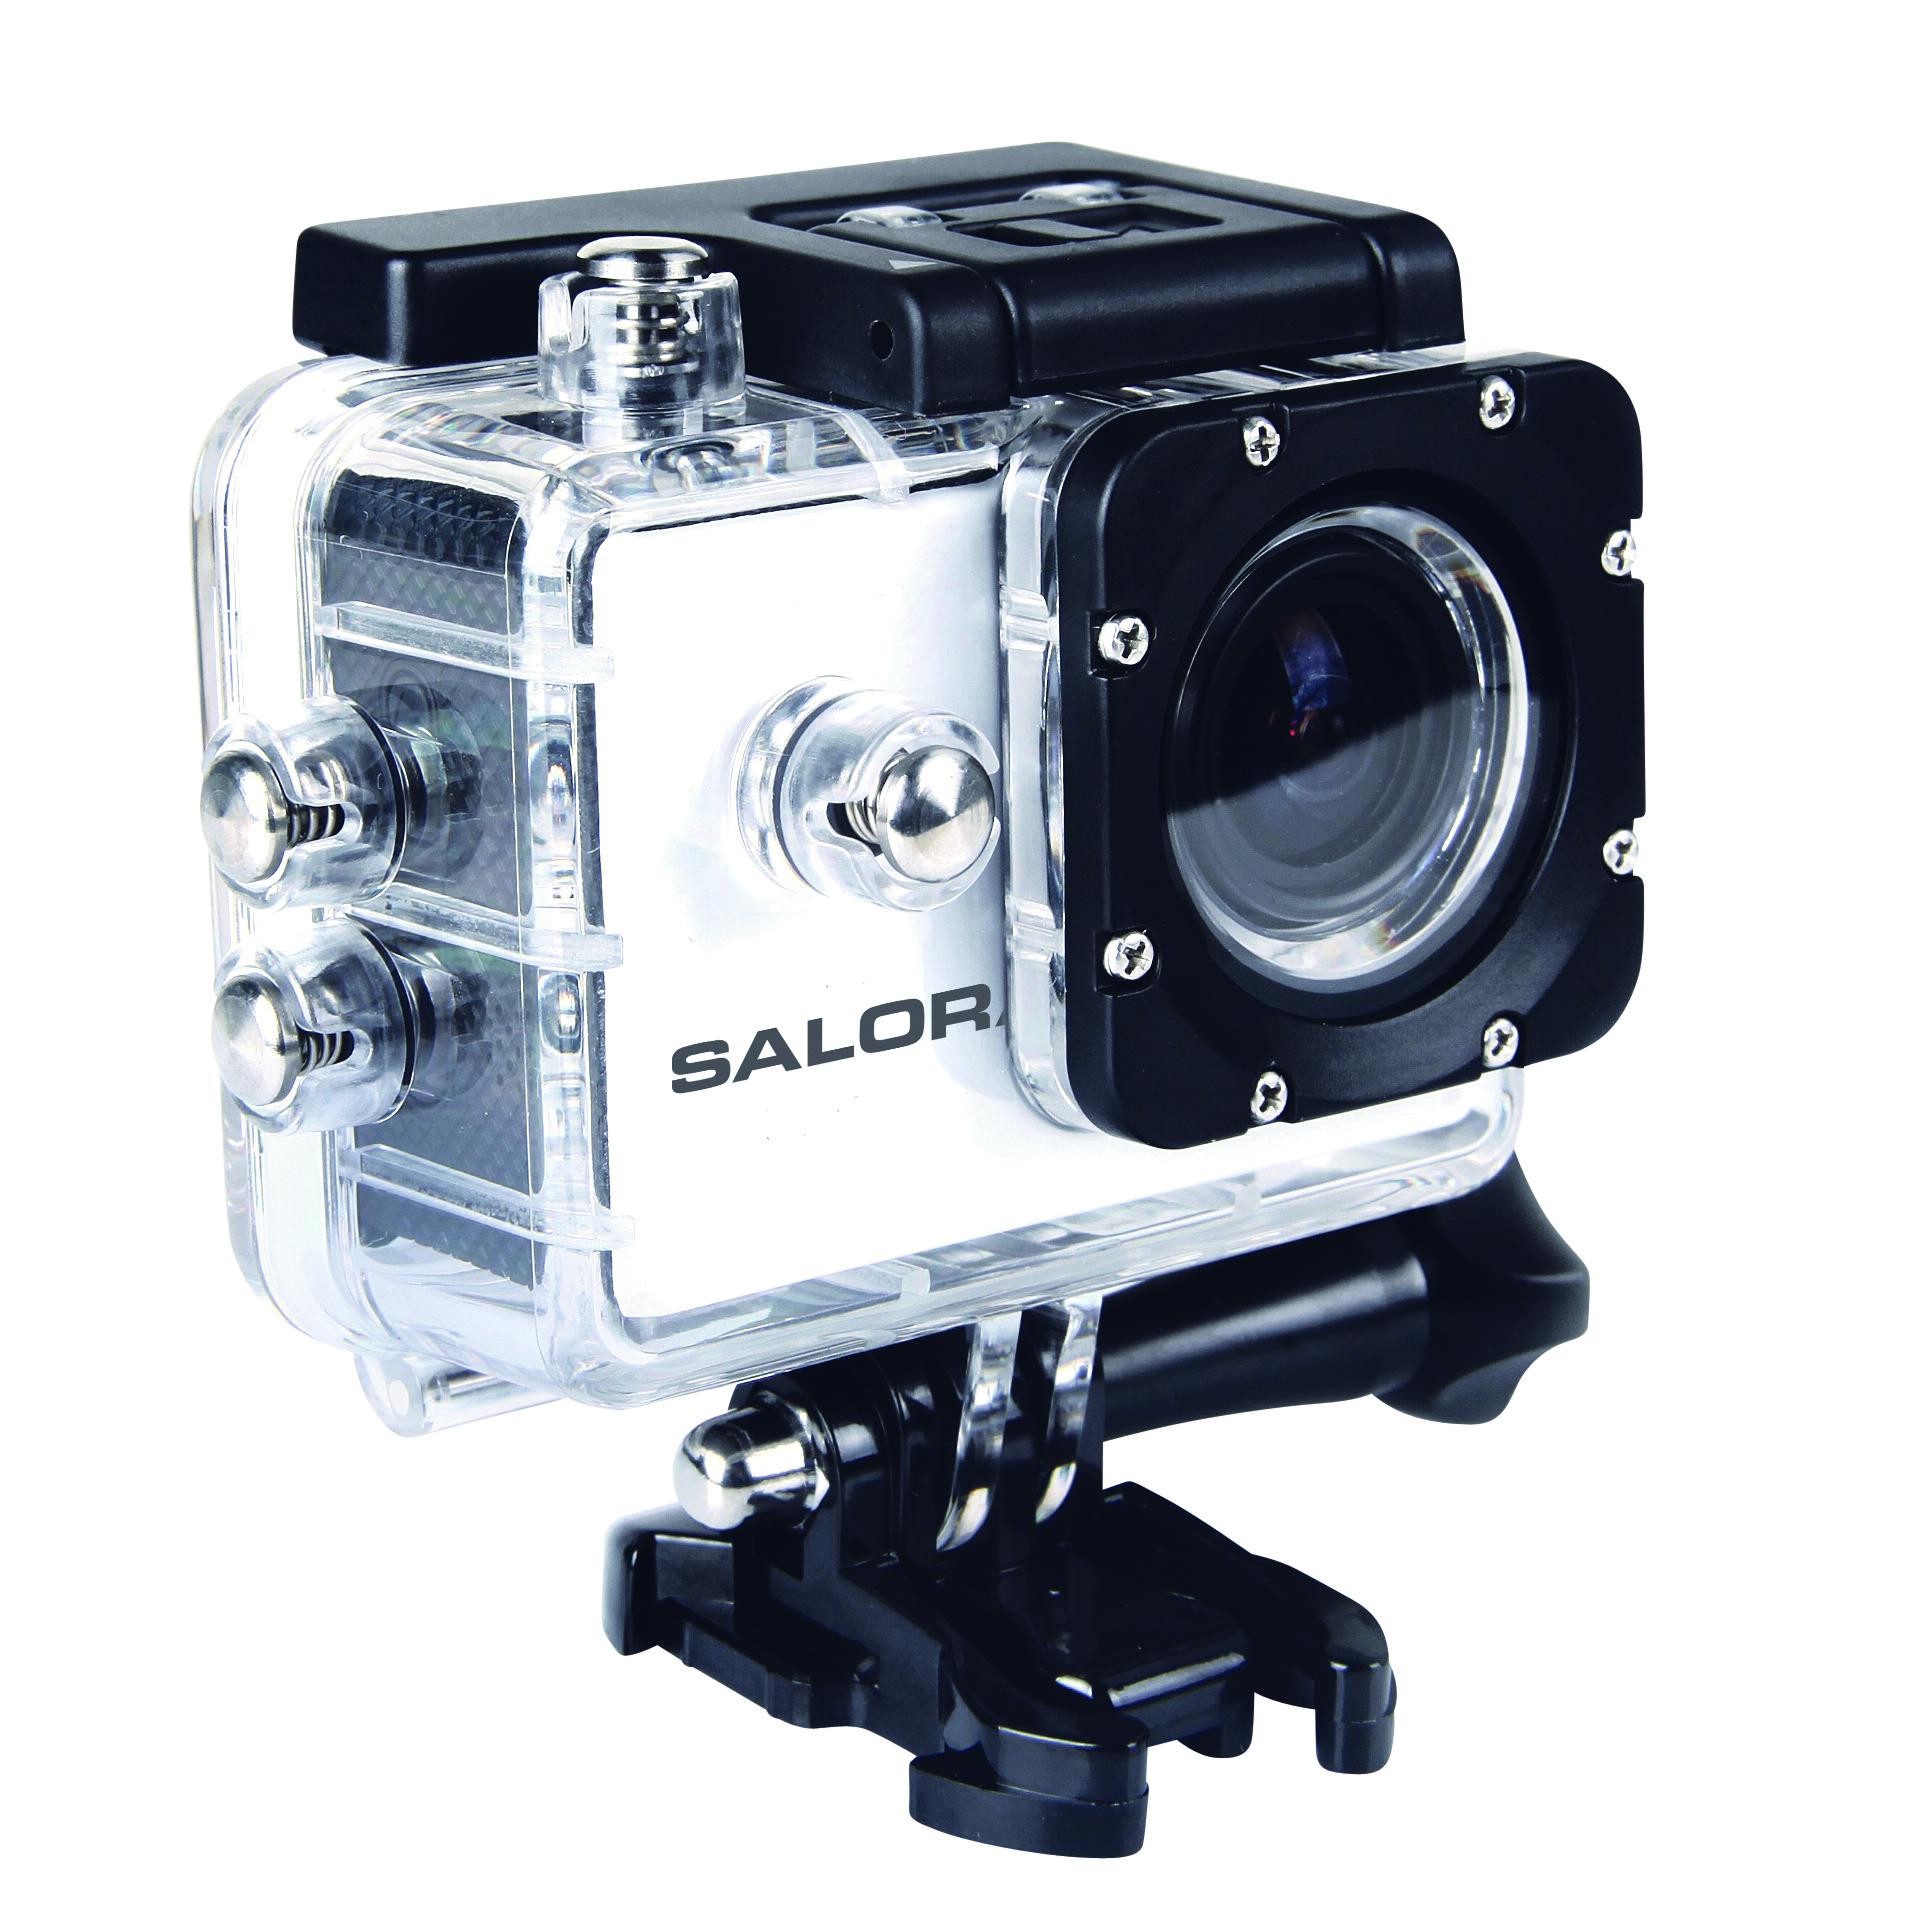 Image of Salora Actiecamera PSC1335HD HD